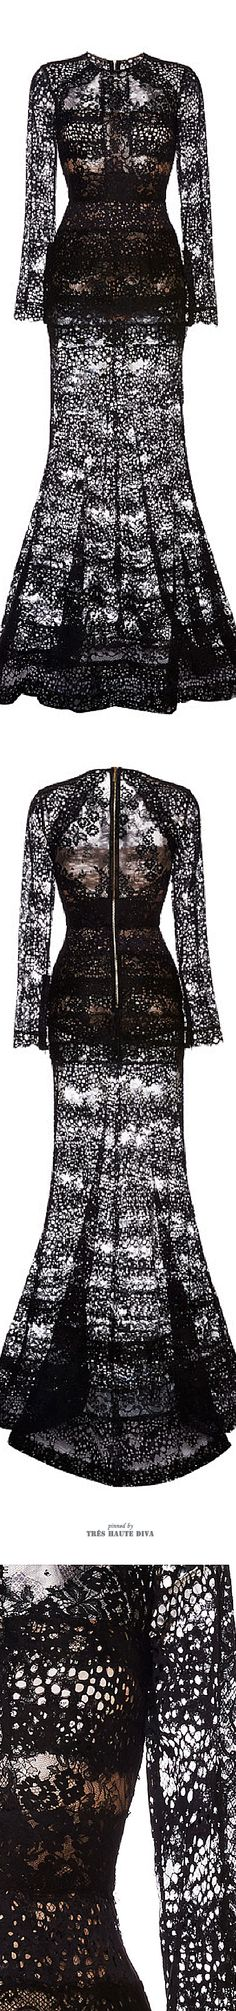 Ellie Saab Black Lace Column Gown ♔ SS 2015